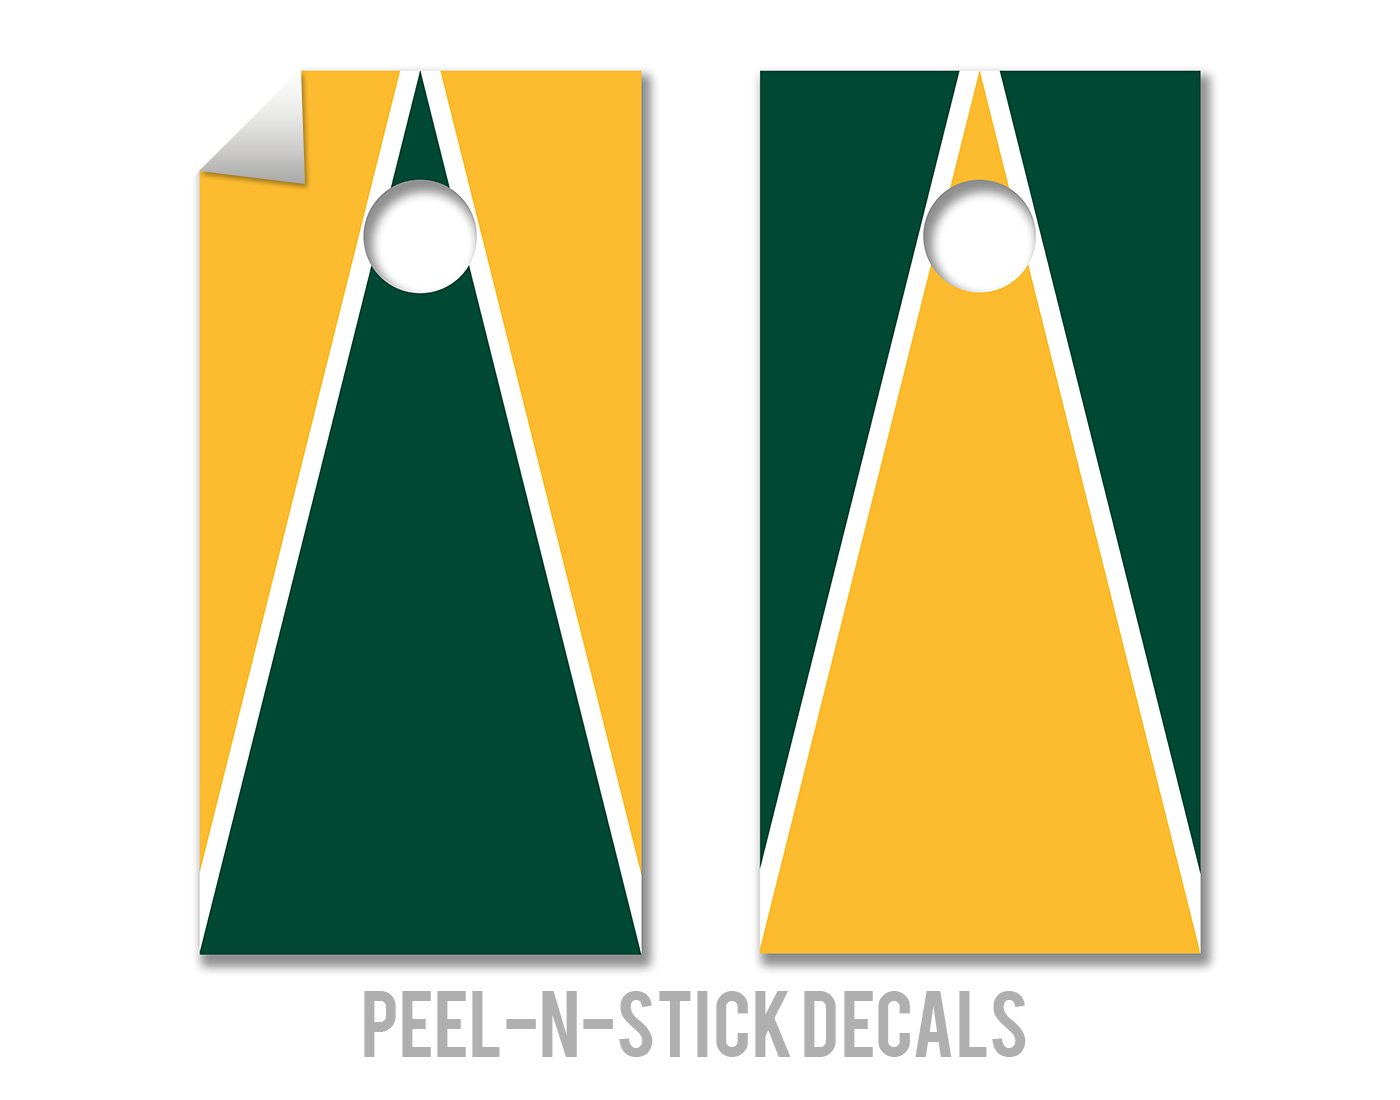 Green & Gold Design - Cornhole Crew - ACA Regulation Size Cornhole Board Decals by The Cornhole Crew